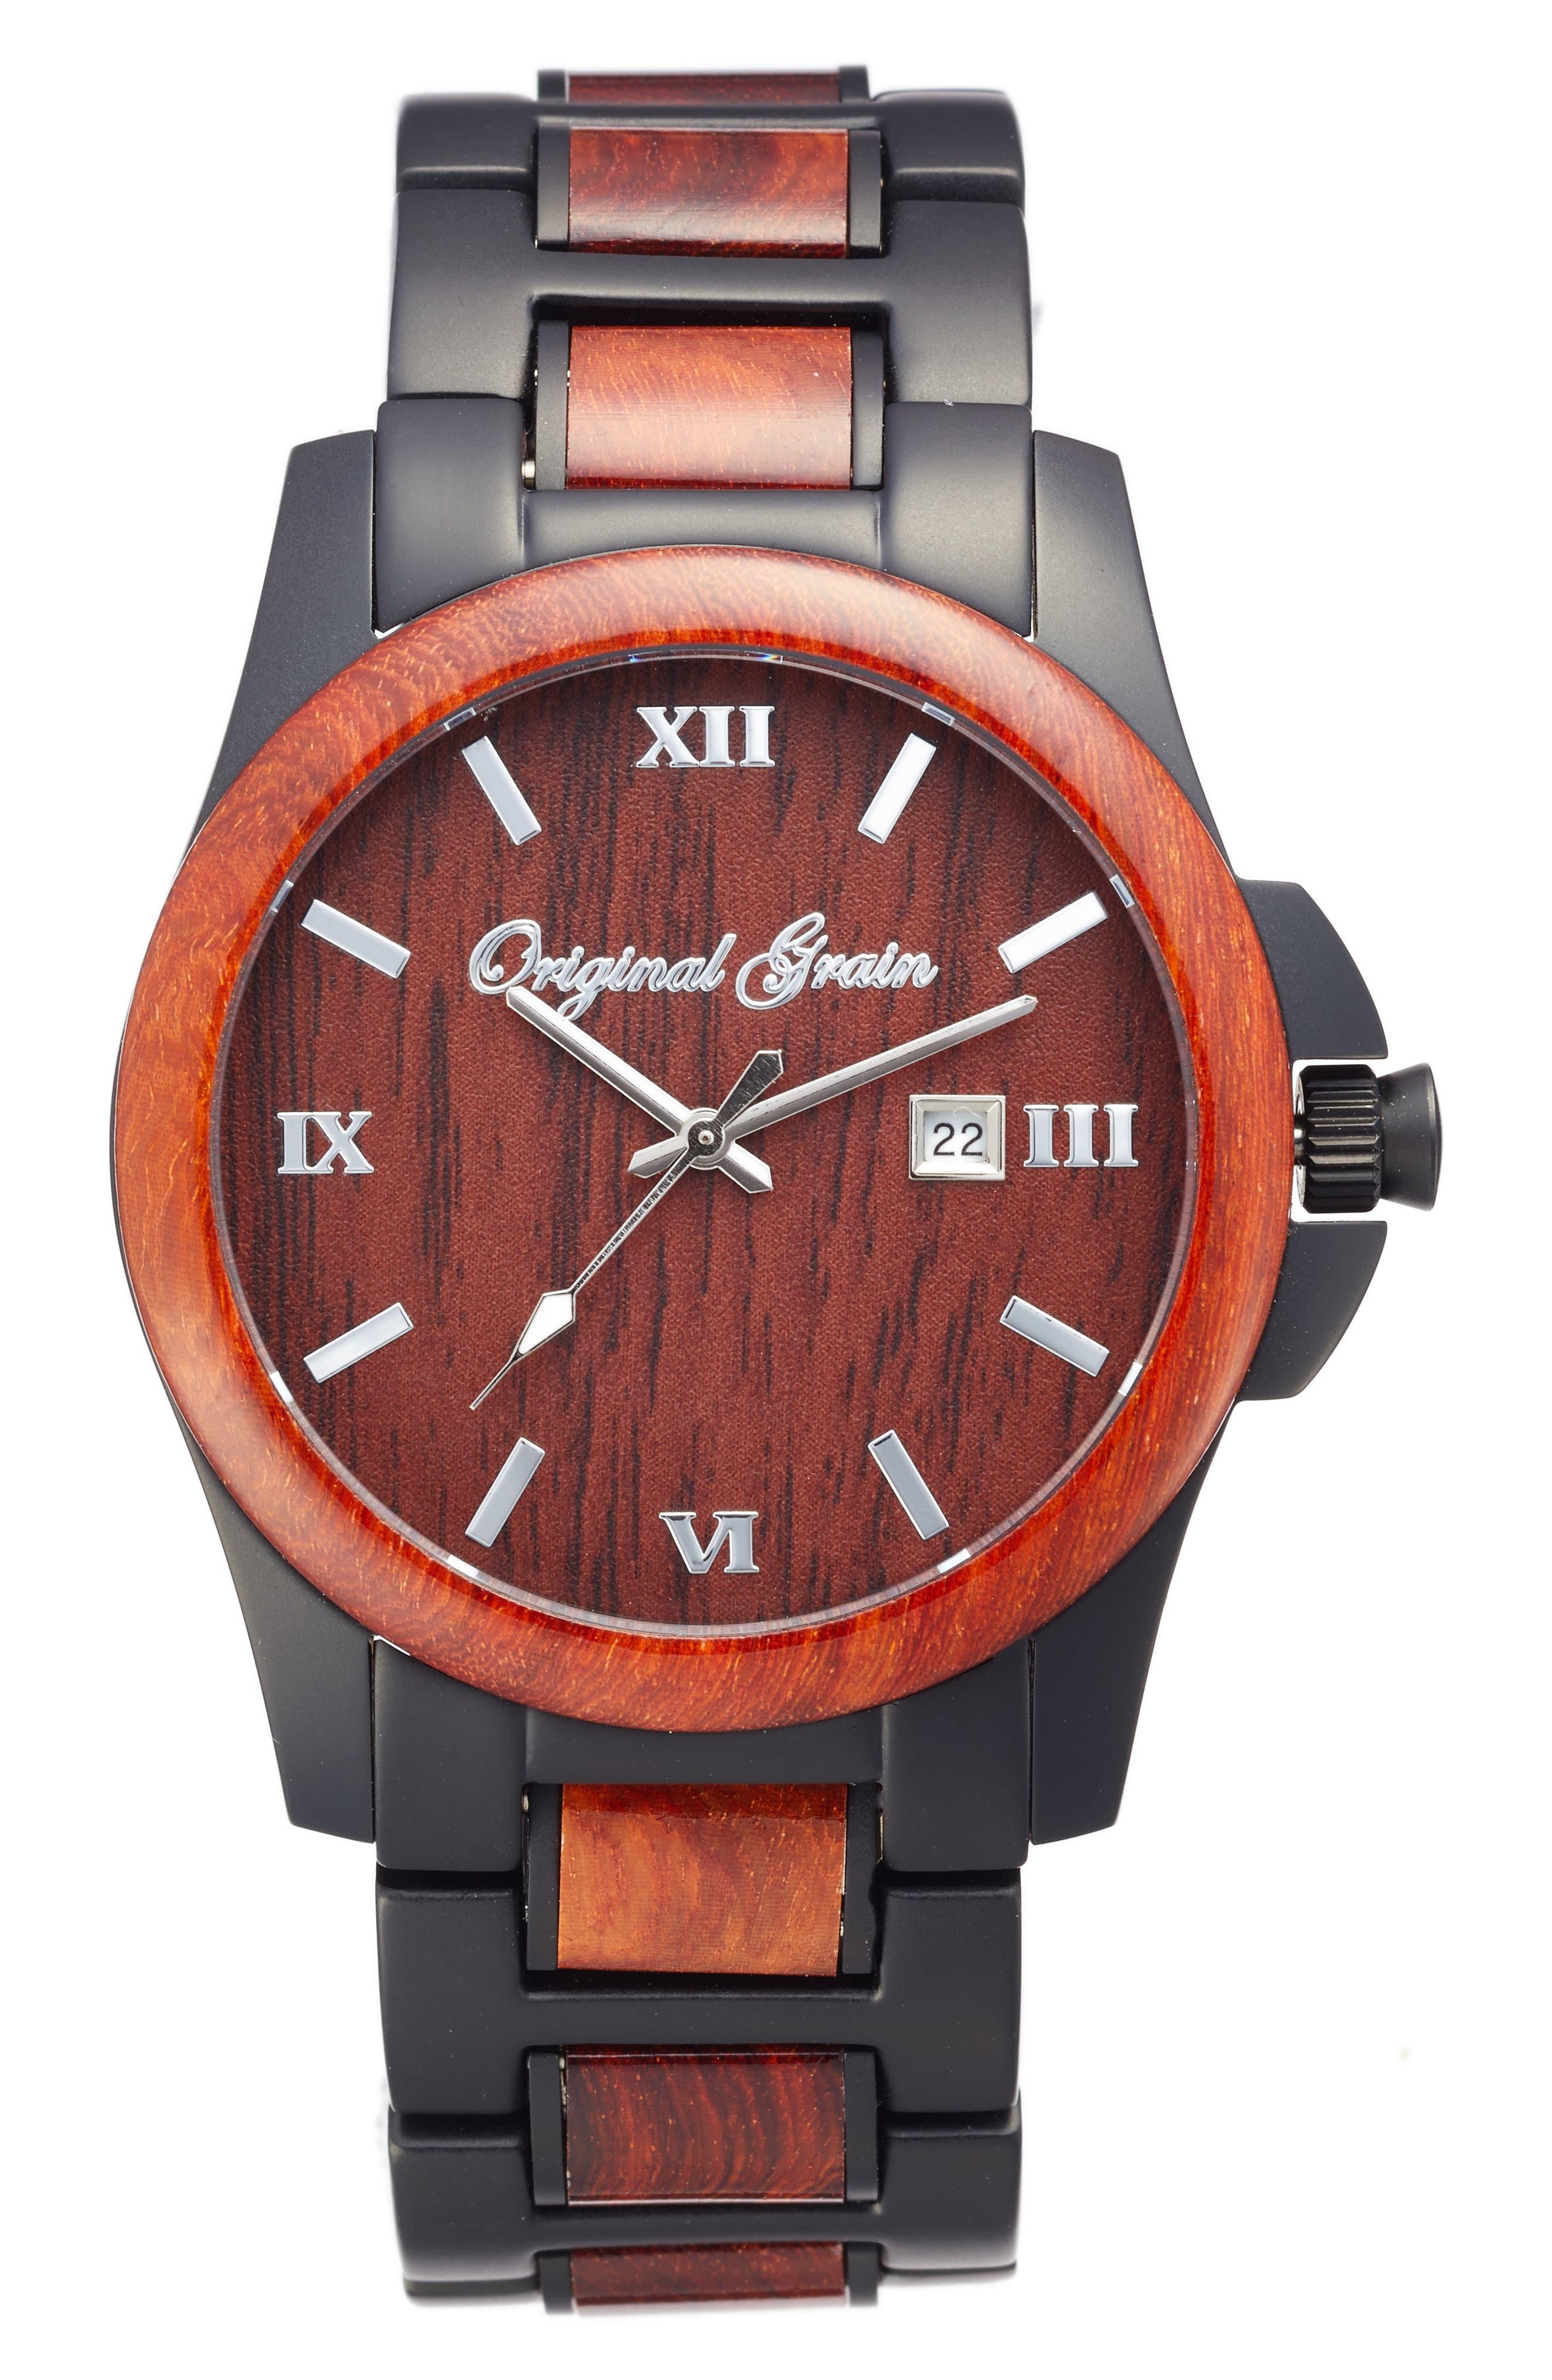 Alternate Image 1 Selected - Original Grain The Classic Bracelet Watch, 43mm